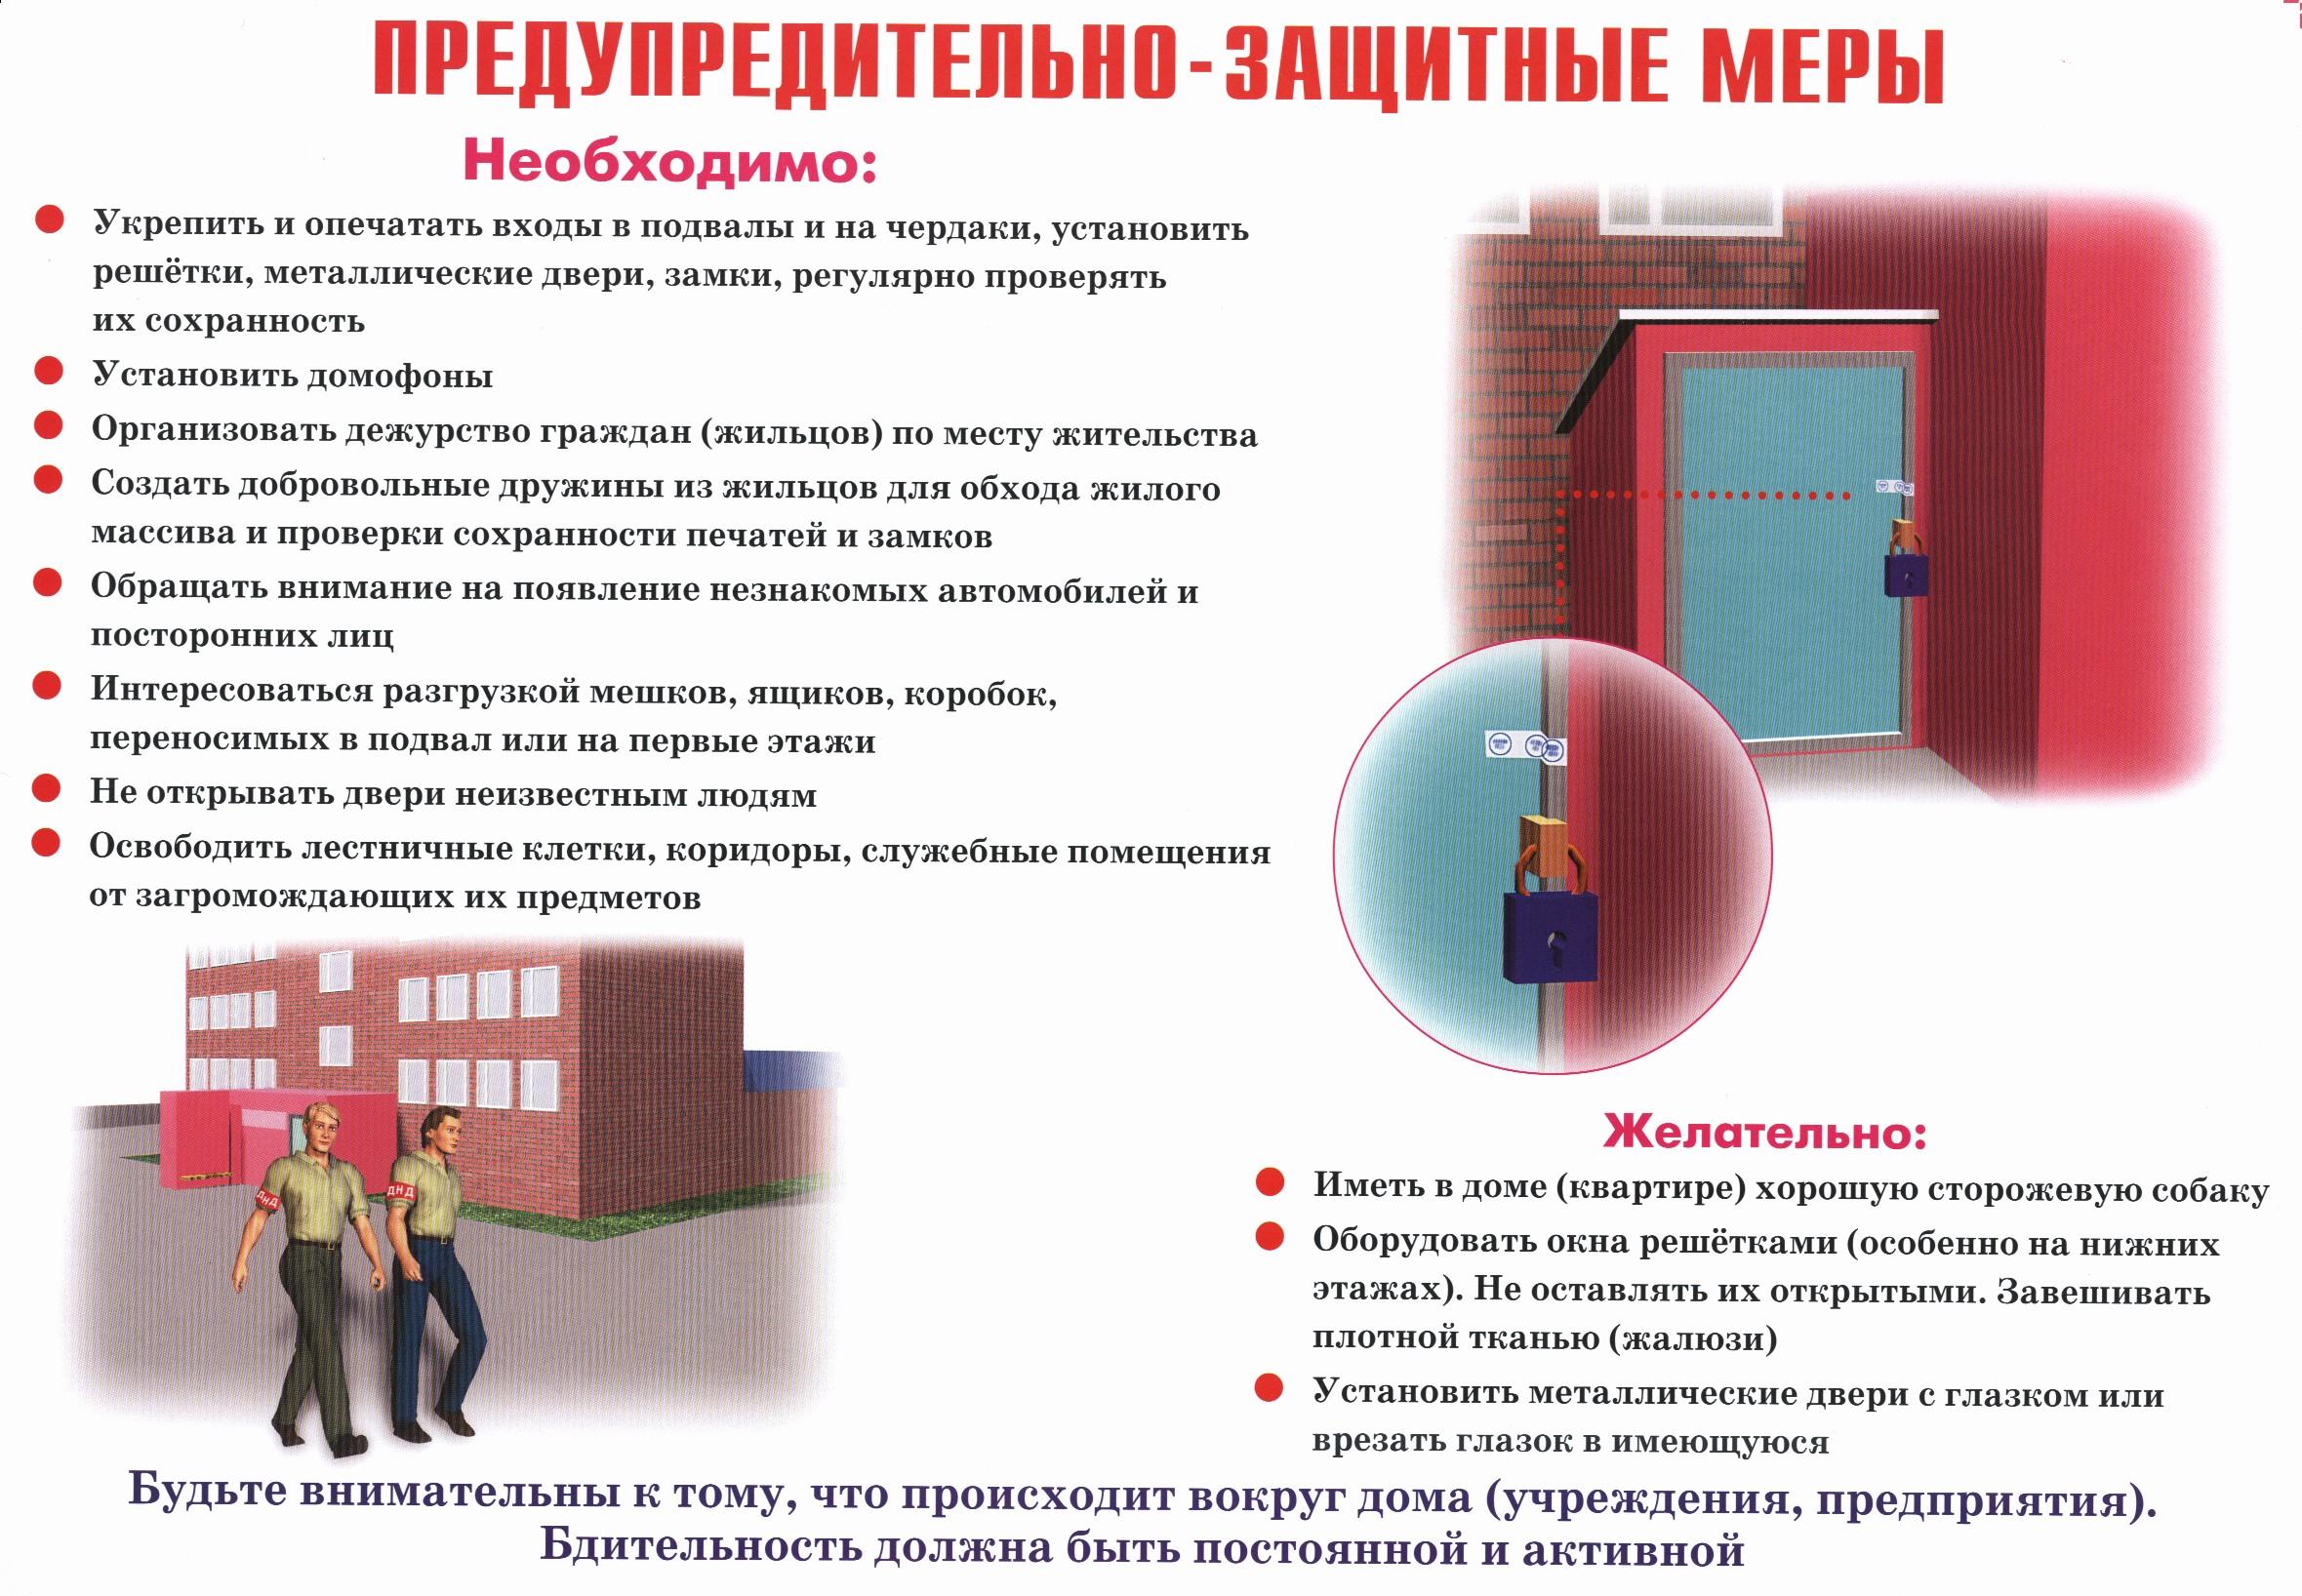 Инструкция Чоп При Захвате Заложников